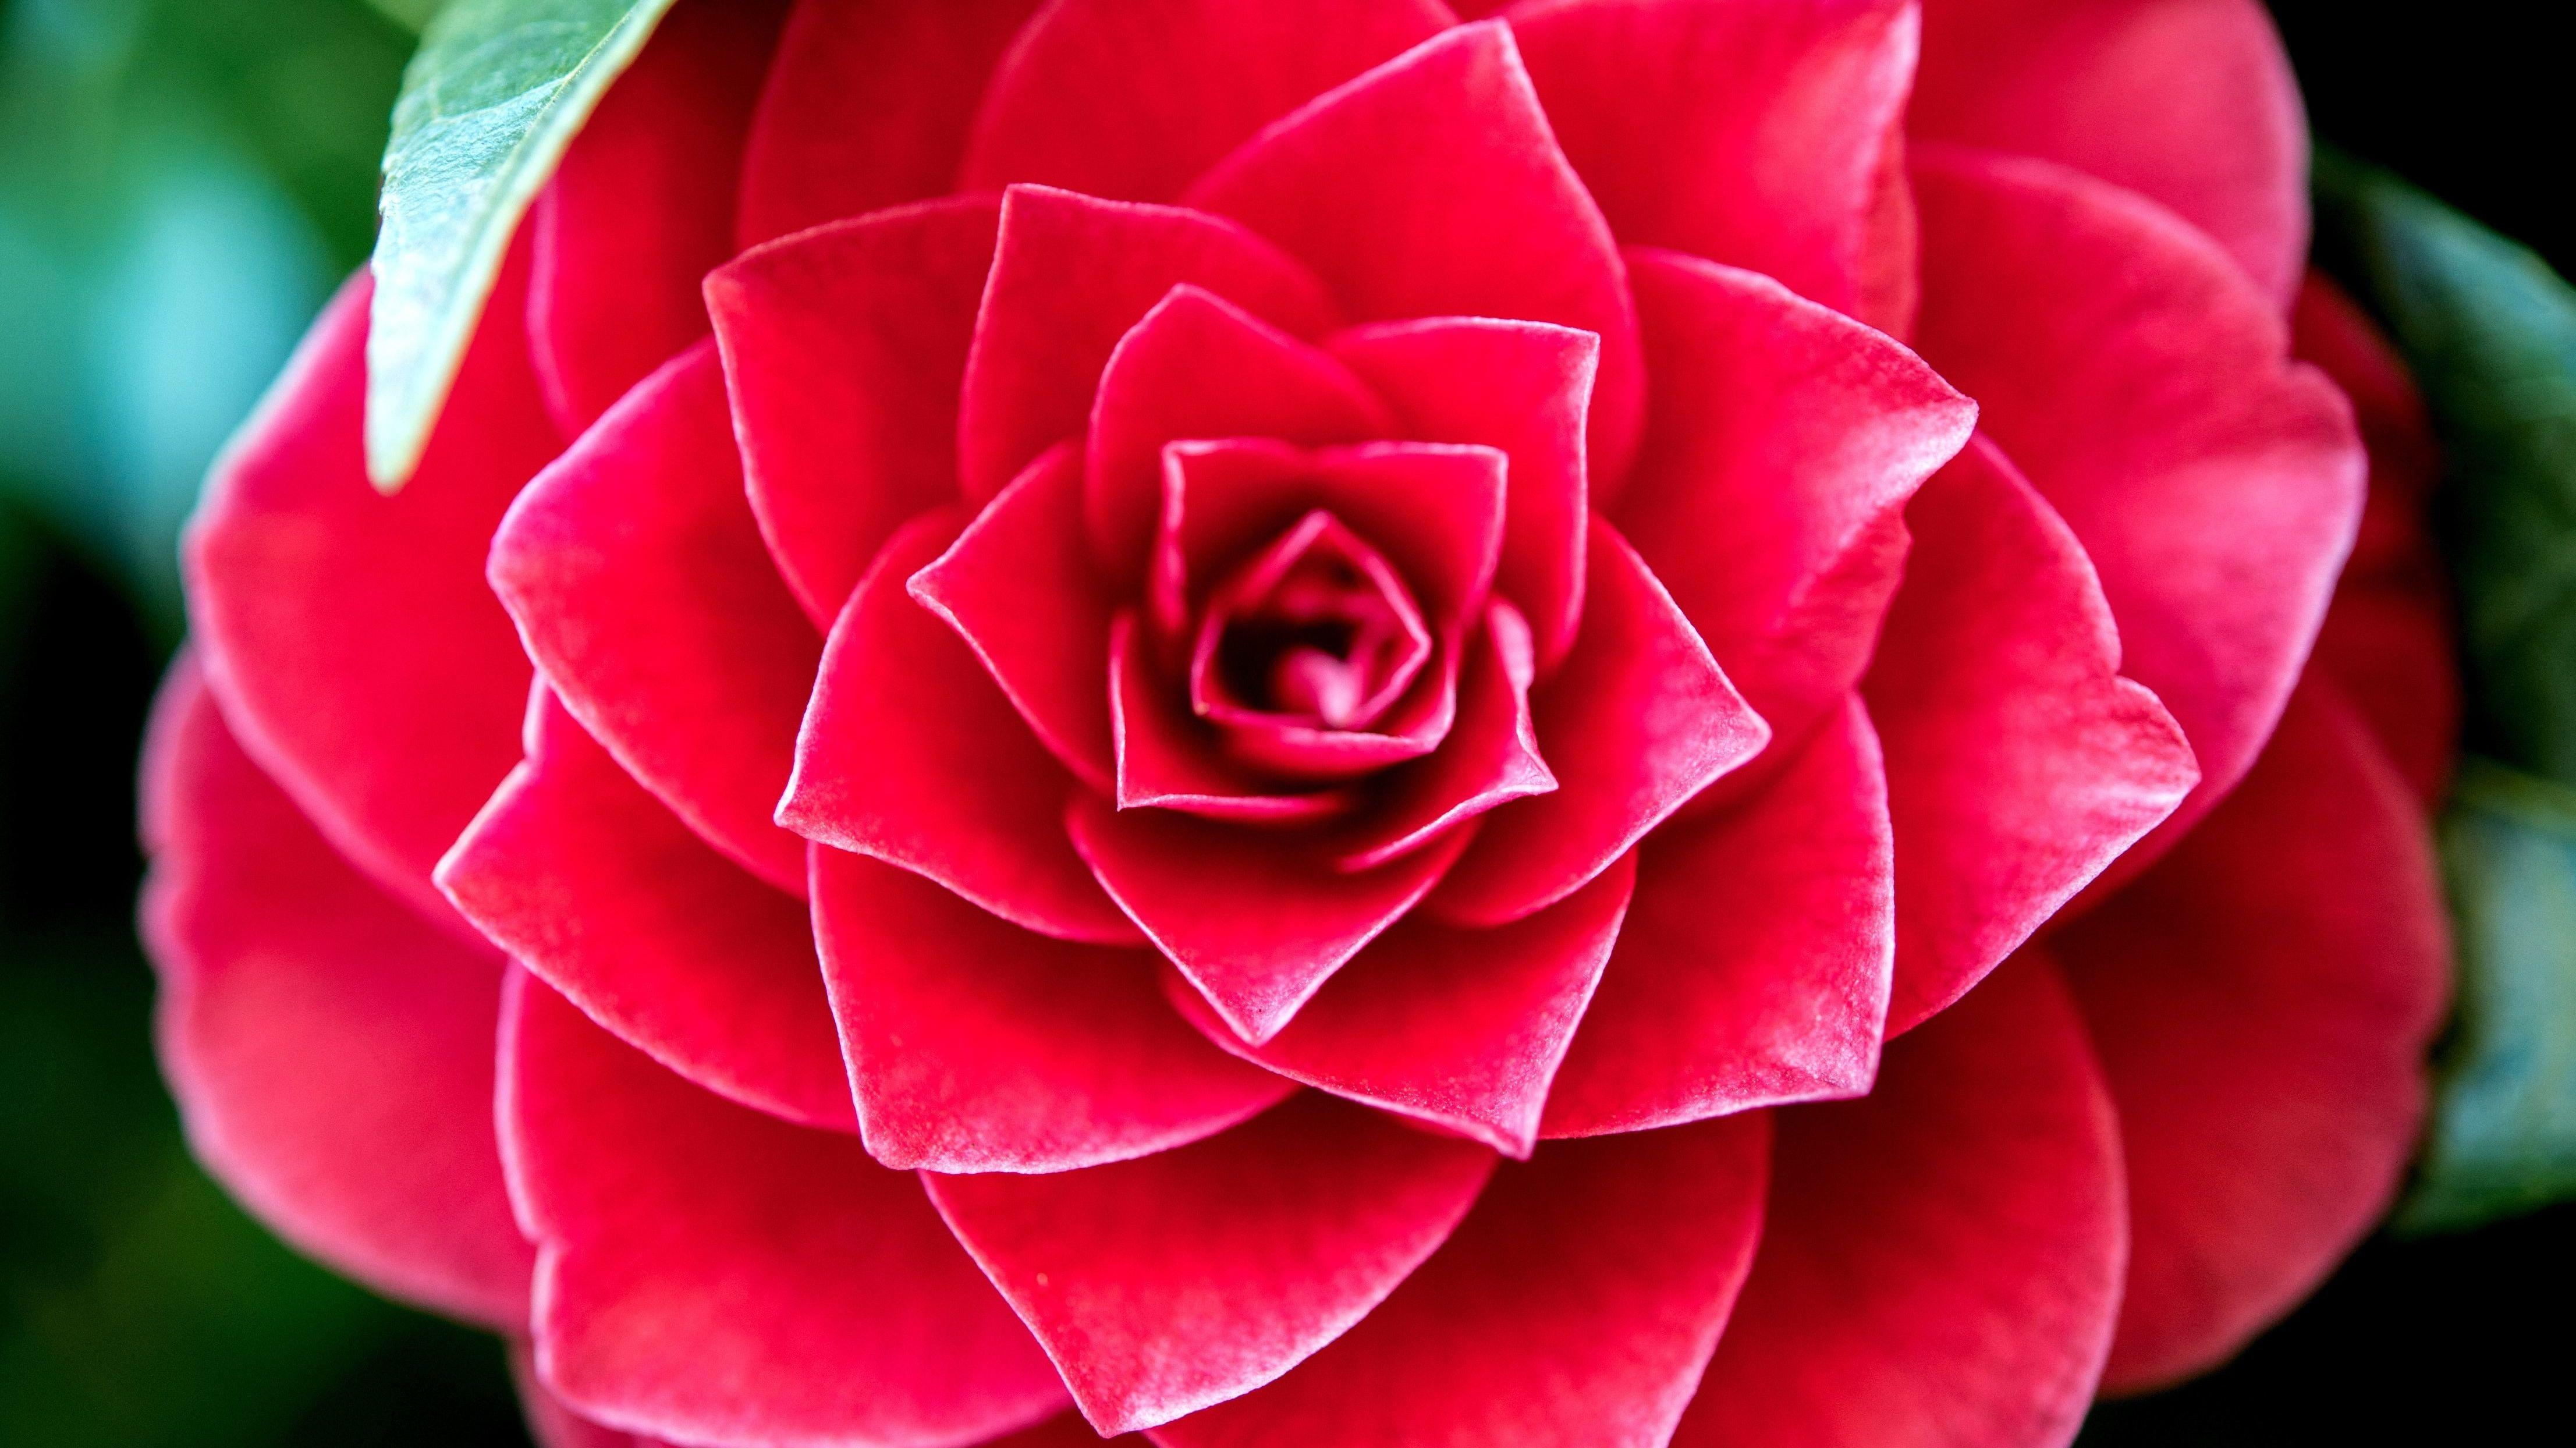 Eine rote Kamelie (Camellia japonica)